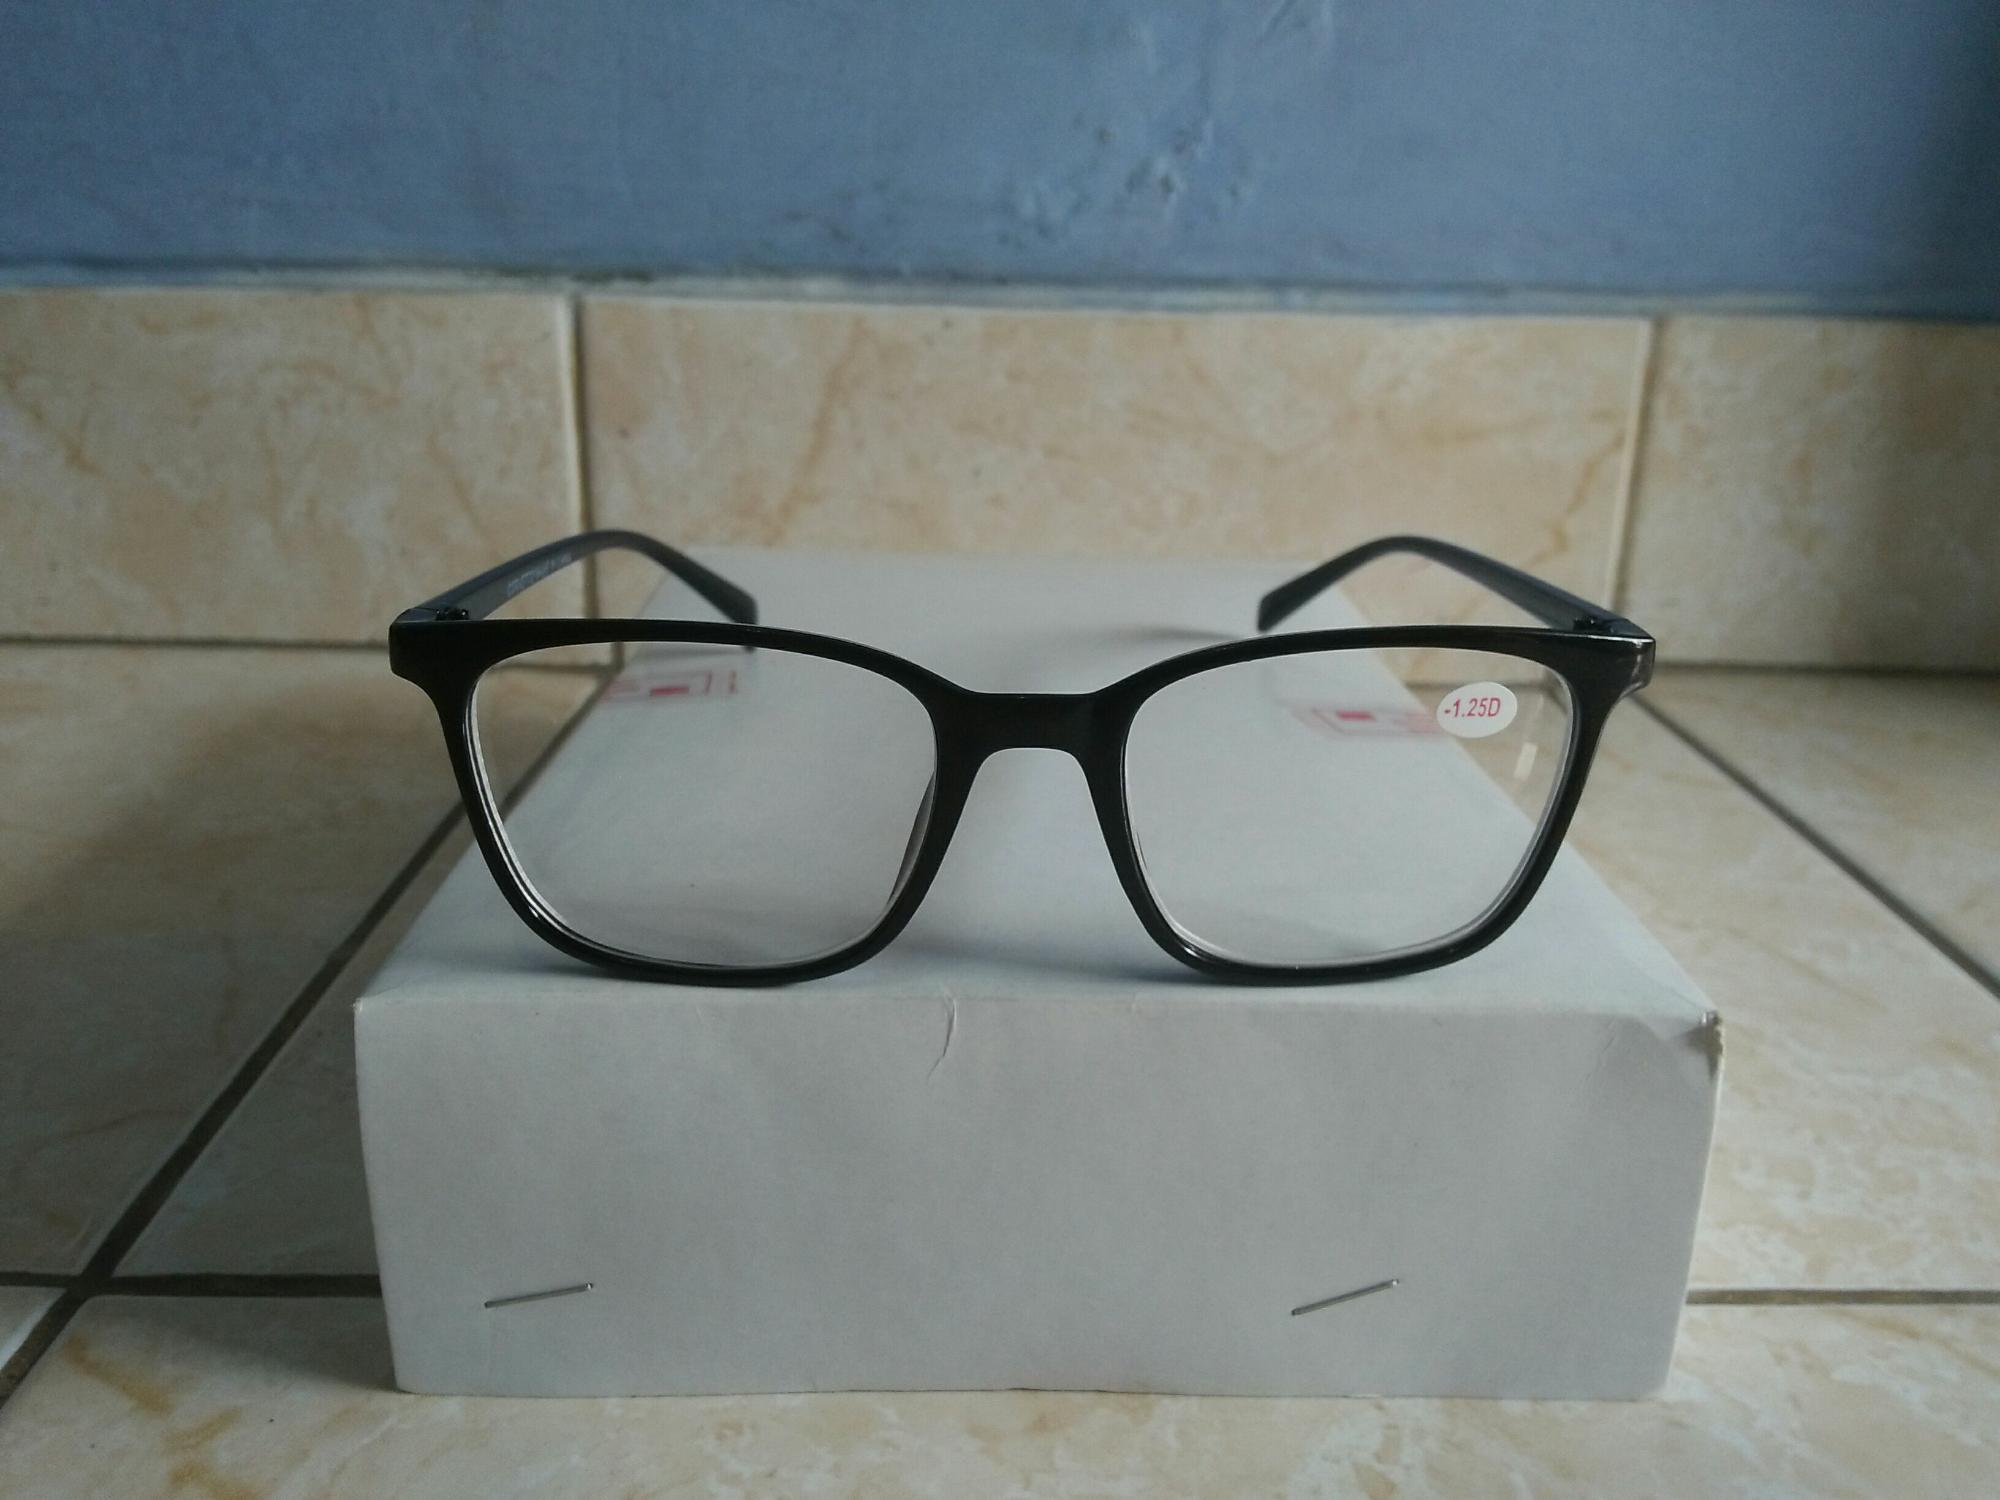 Promo kacamata minus 1.50 kacamata baca persegi hitam trendy dan gaya korea  AI624 e66e240aa0